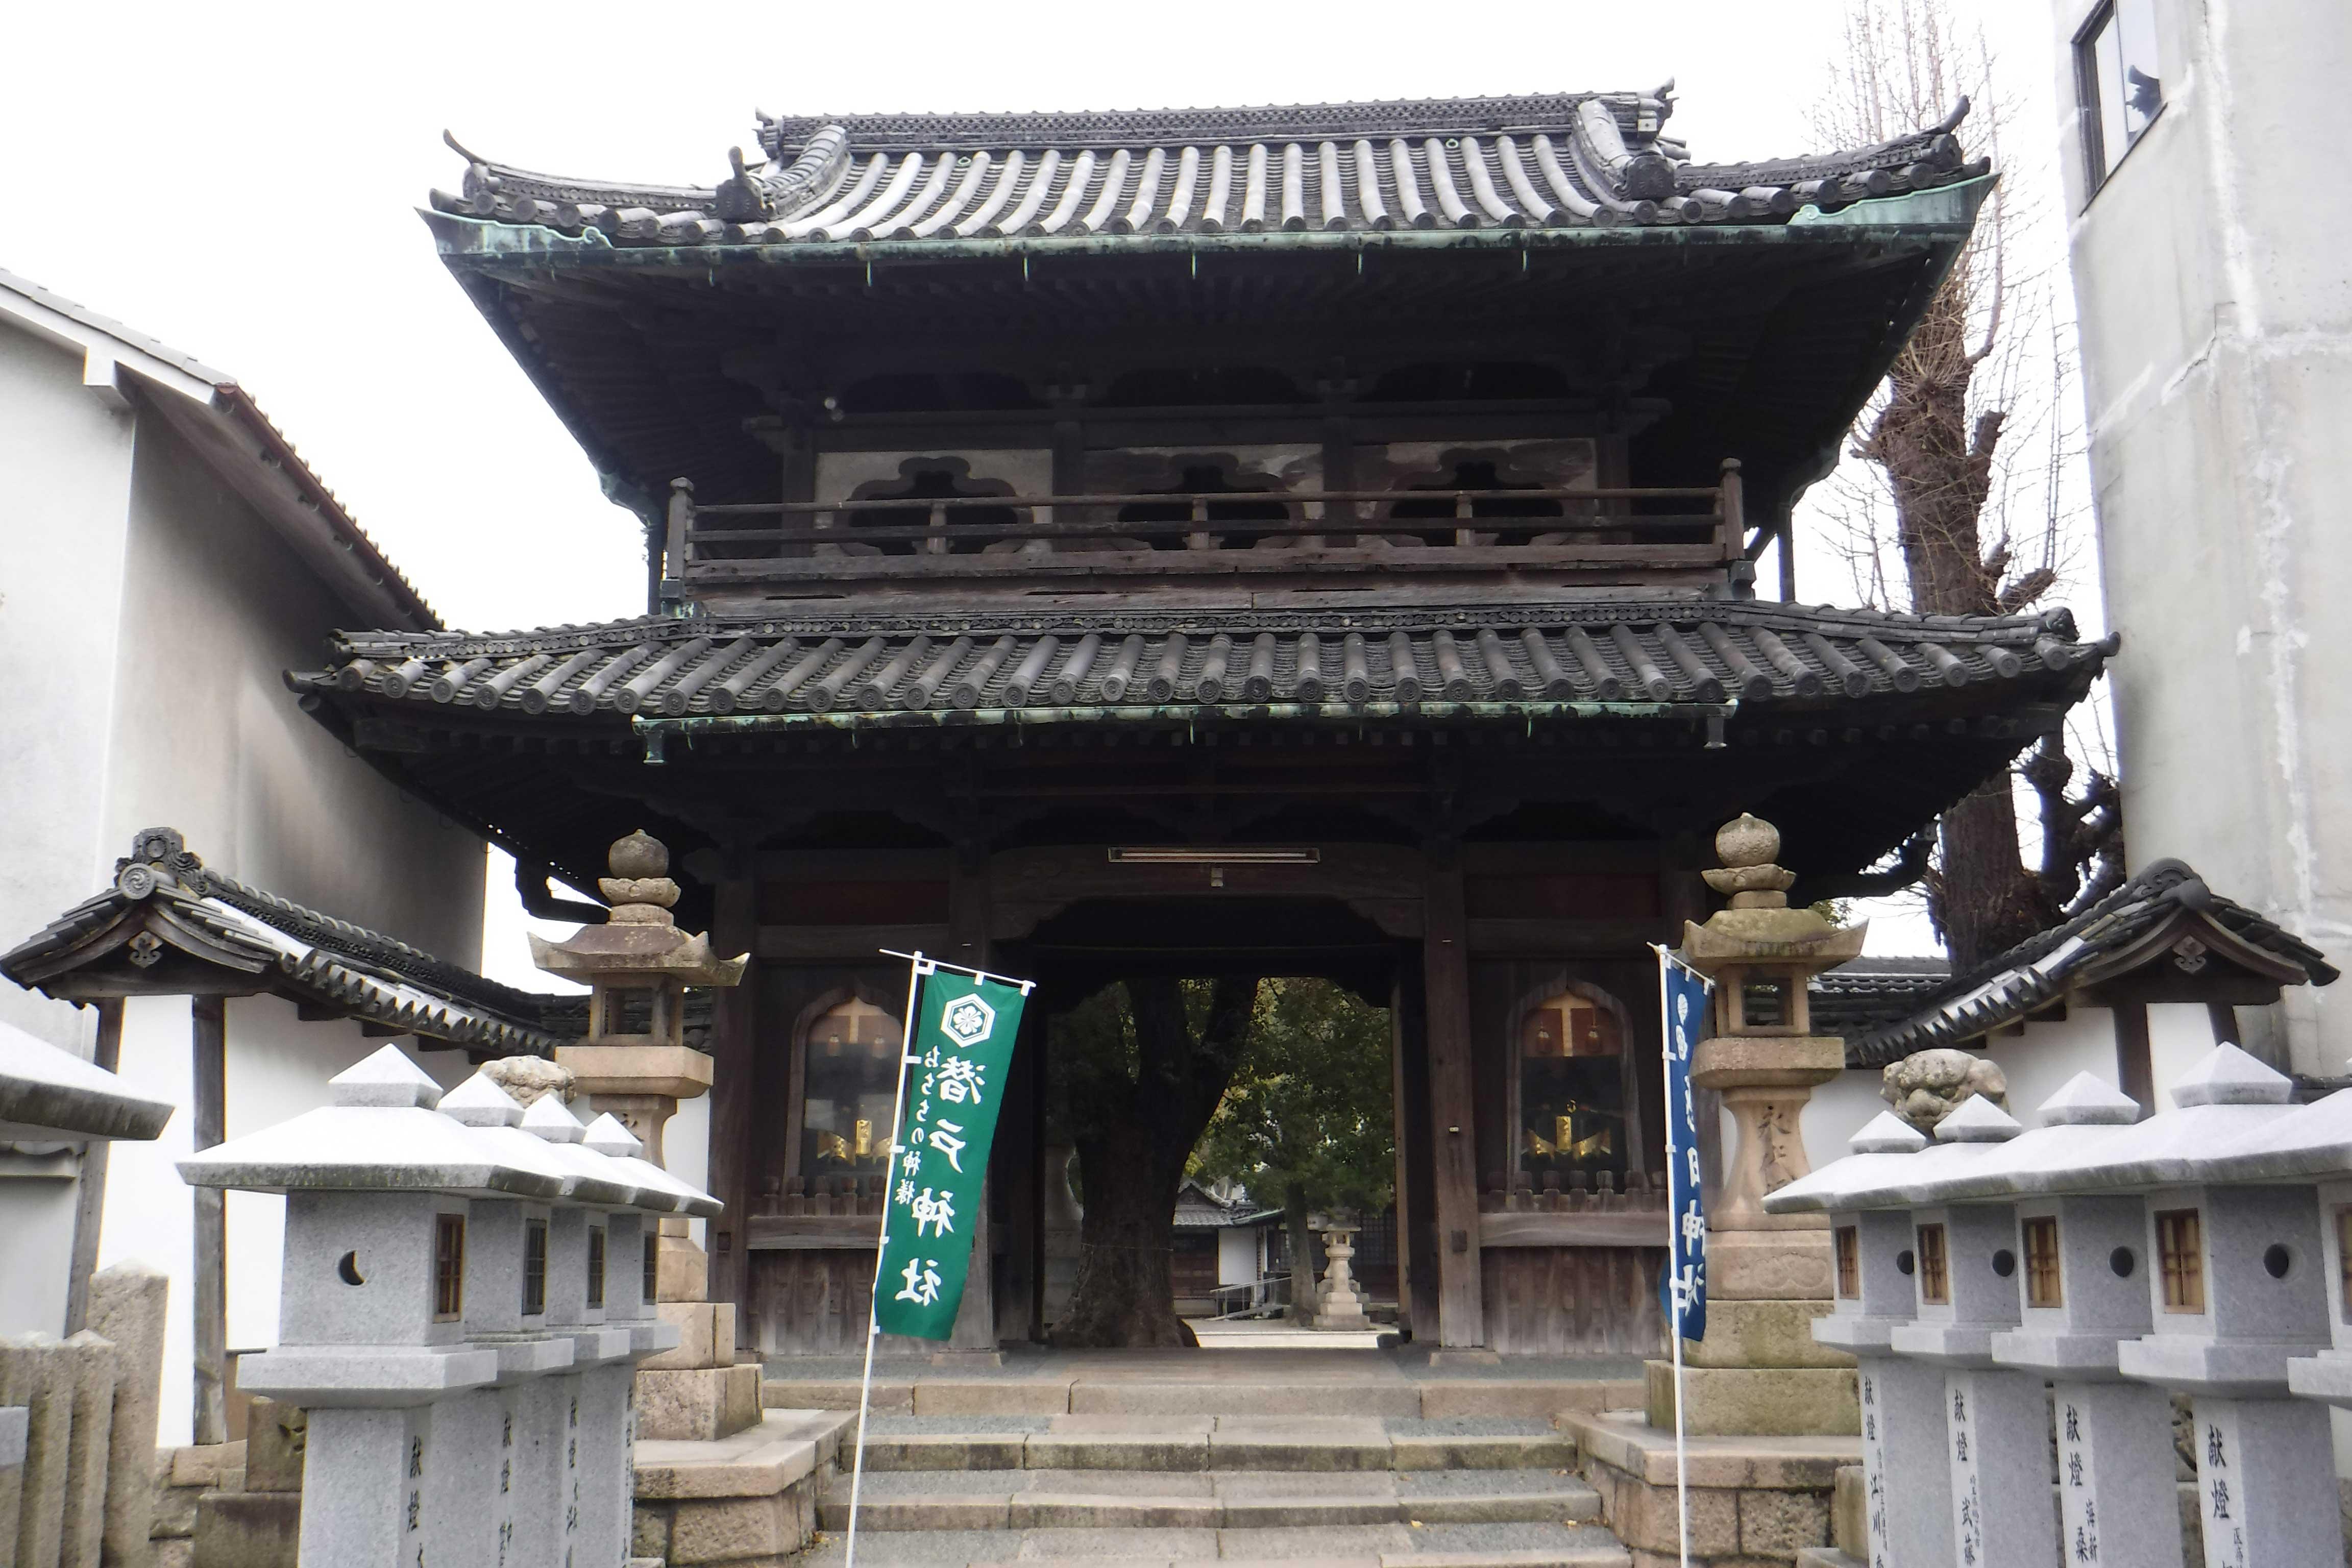 <p>神門正面及土墻</p>安永9年(1780)建築的三間一戸二重門,歇山本瓦頂。